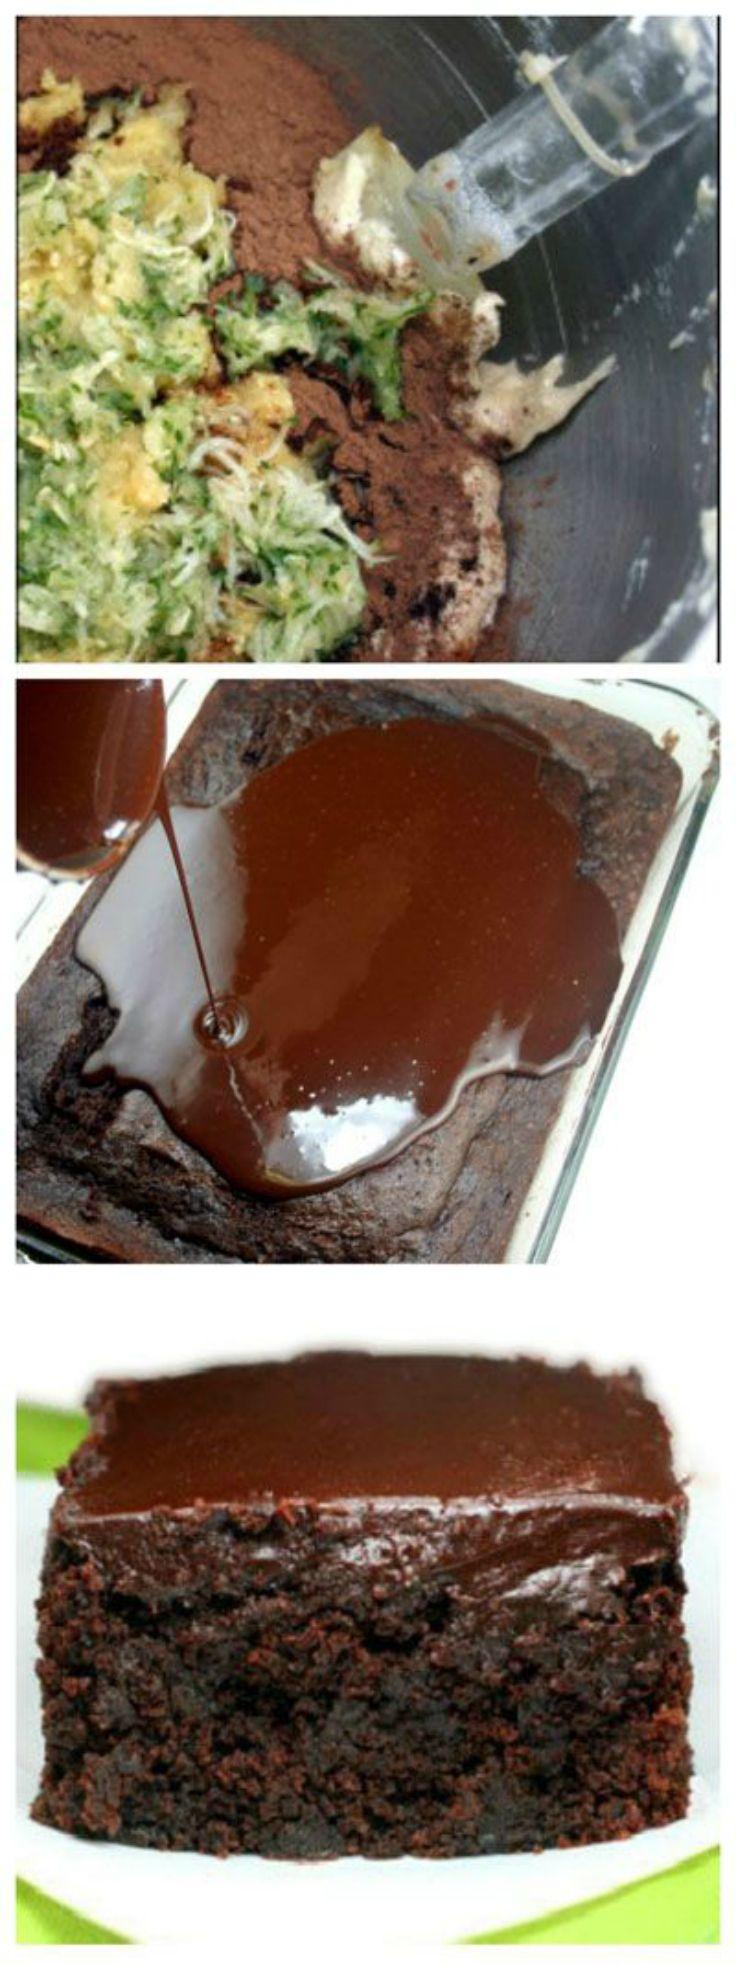 Triple Chocolate Greek Yogurt Zucchini Cake - The moistest, fudgiest chocolate zucchini cake you will ever have! The chocolate ganache seeps into the cracks, making it even fudgier.